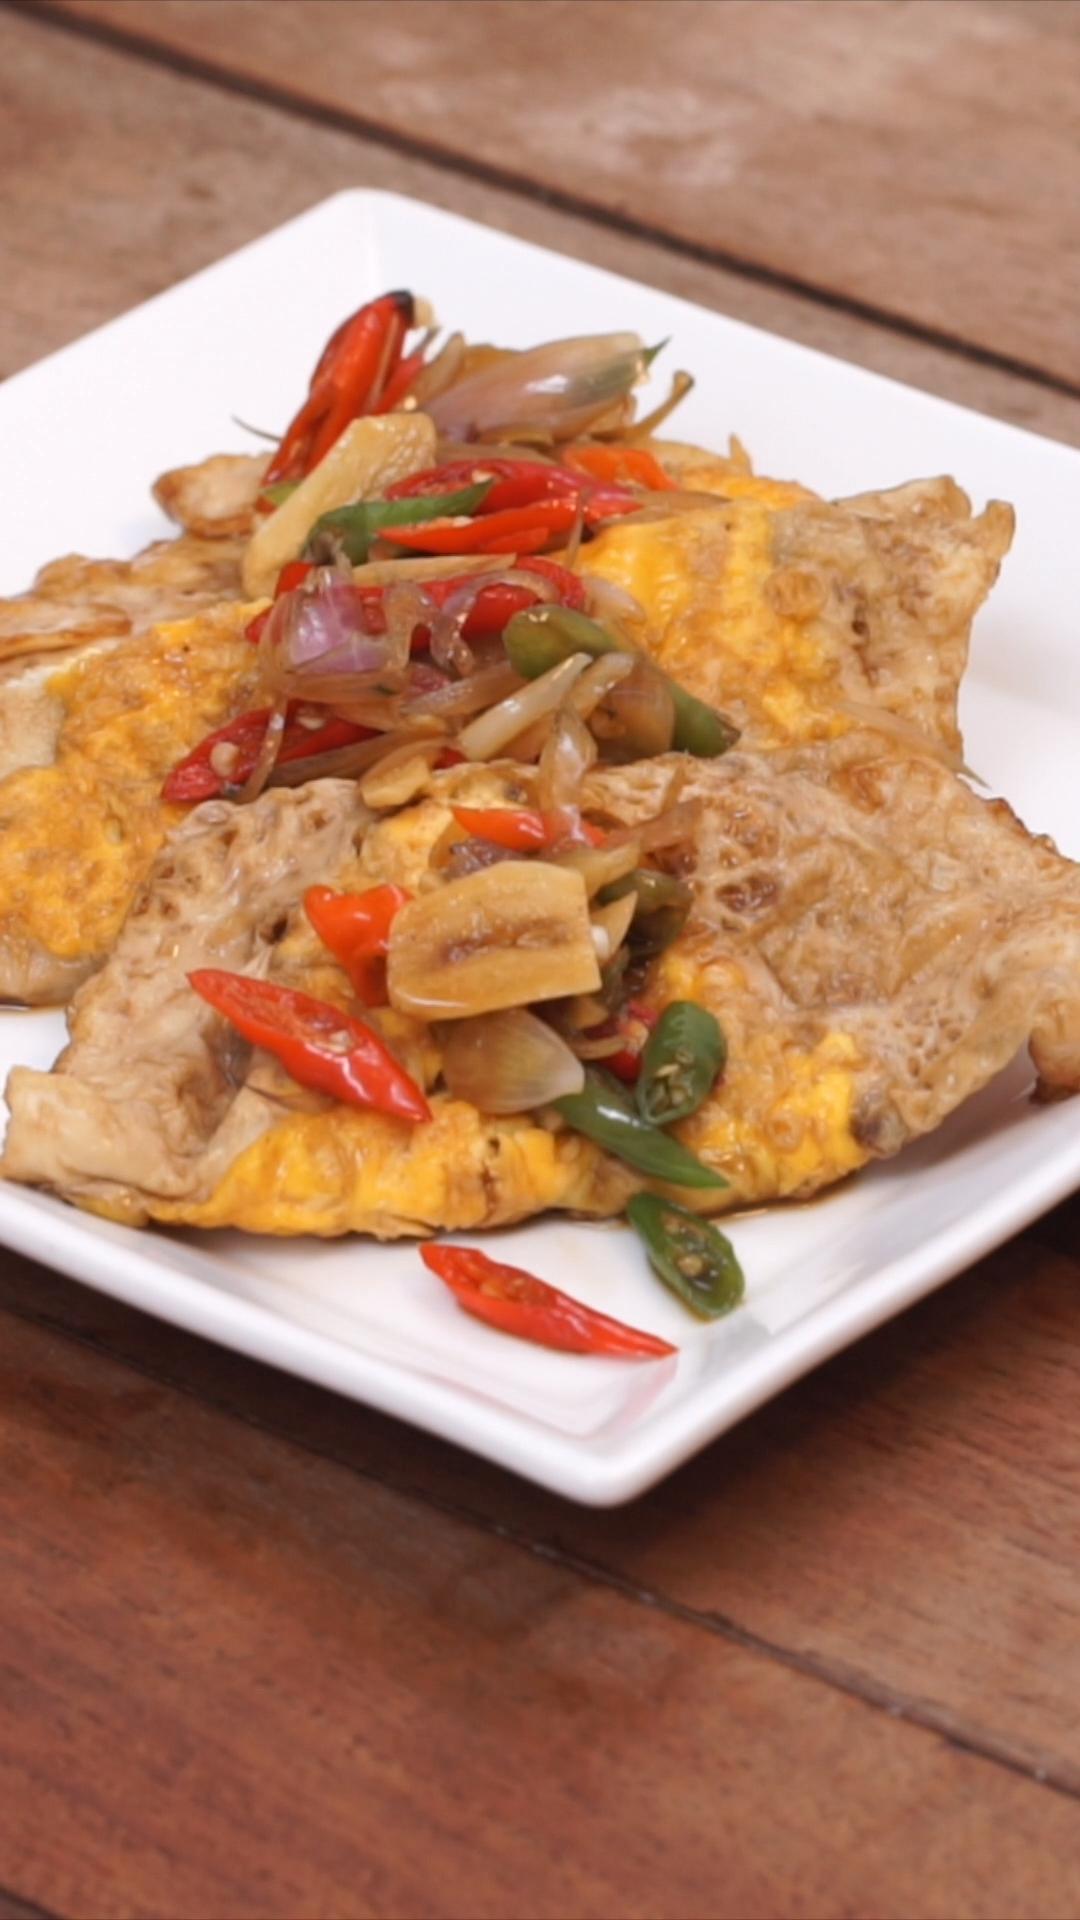 Video Video Telur Ceplok Kuah Kecap Resep Resep Resep Makanan Ide Makanan Masakan Simpel